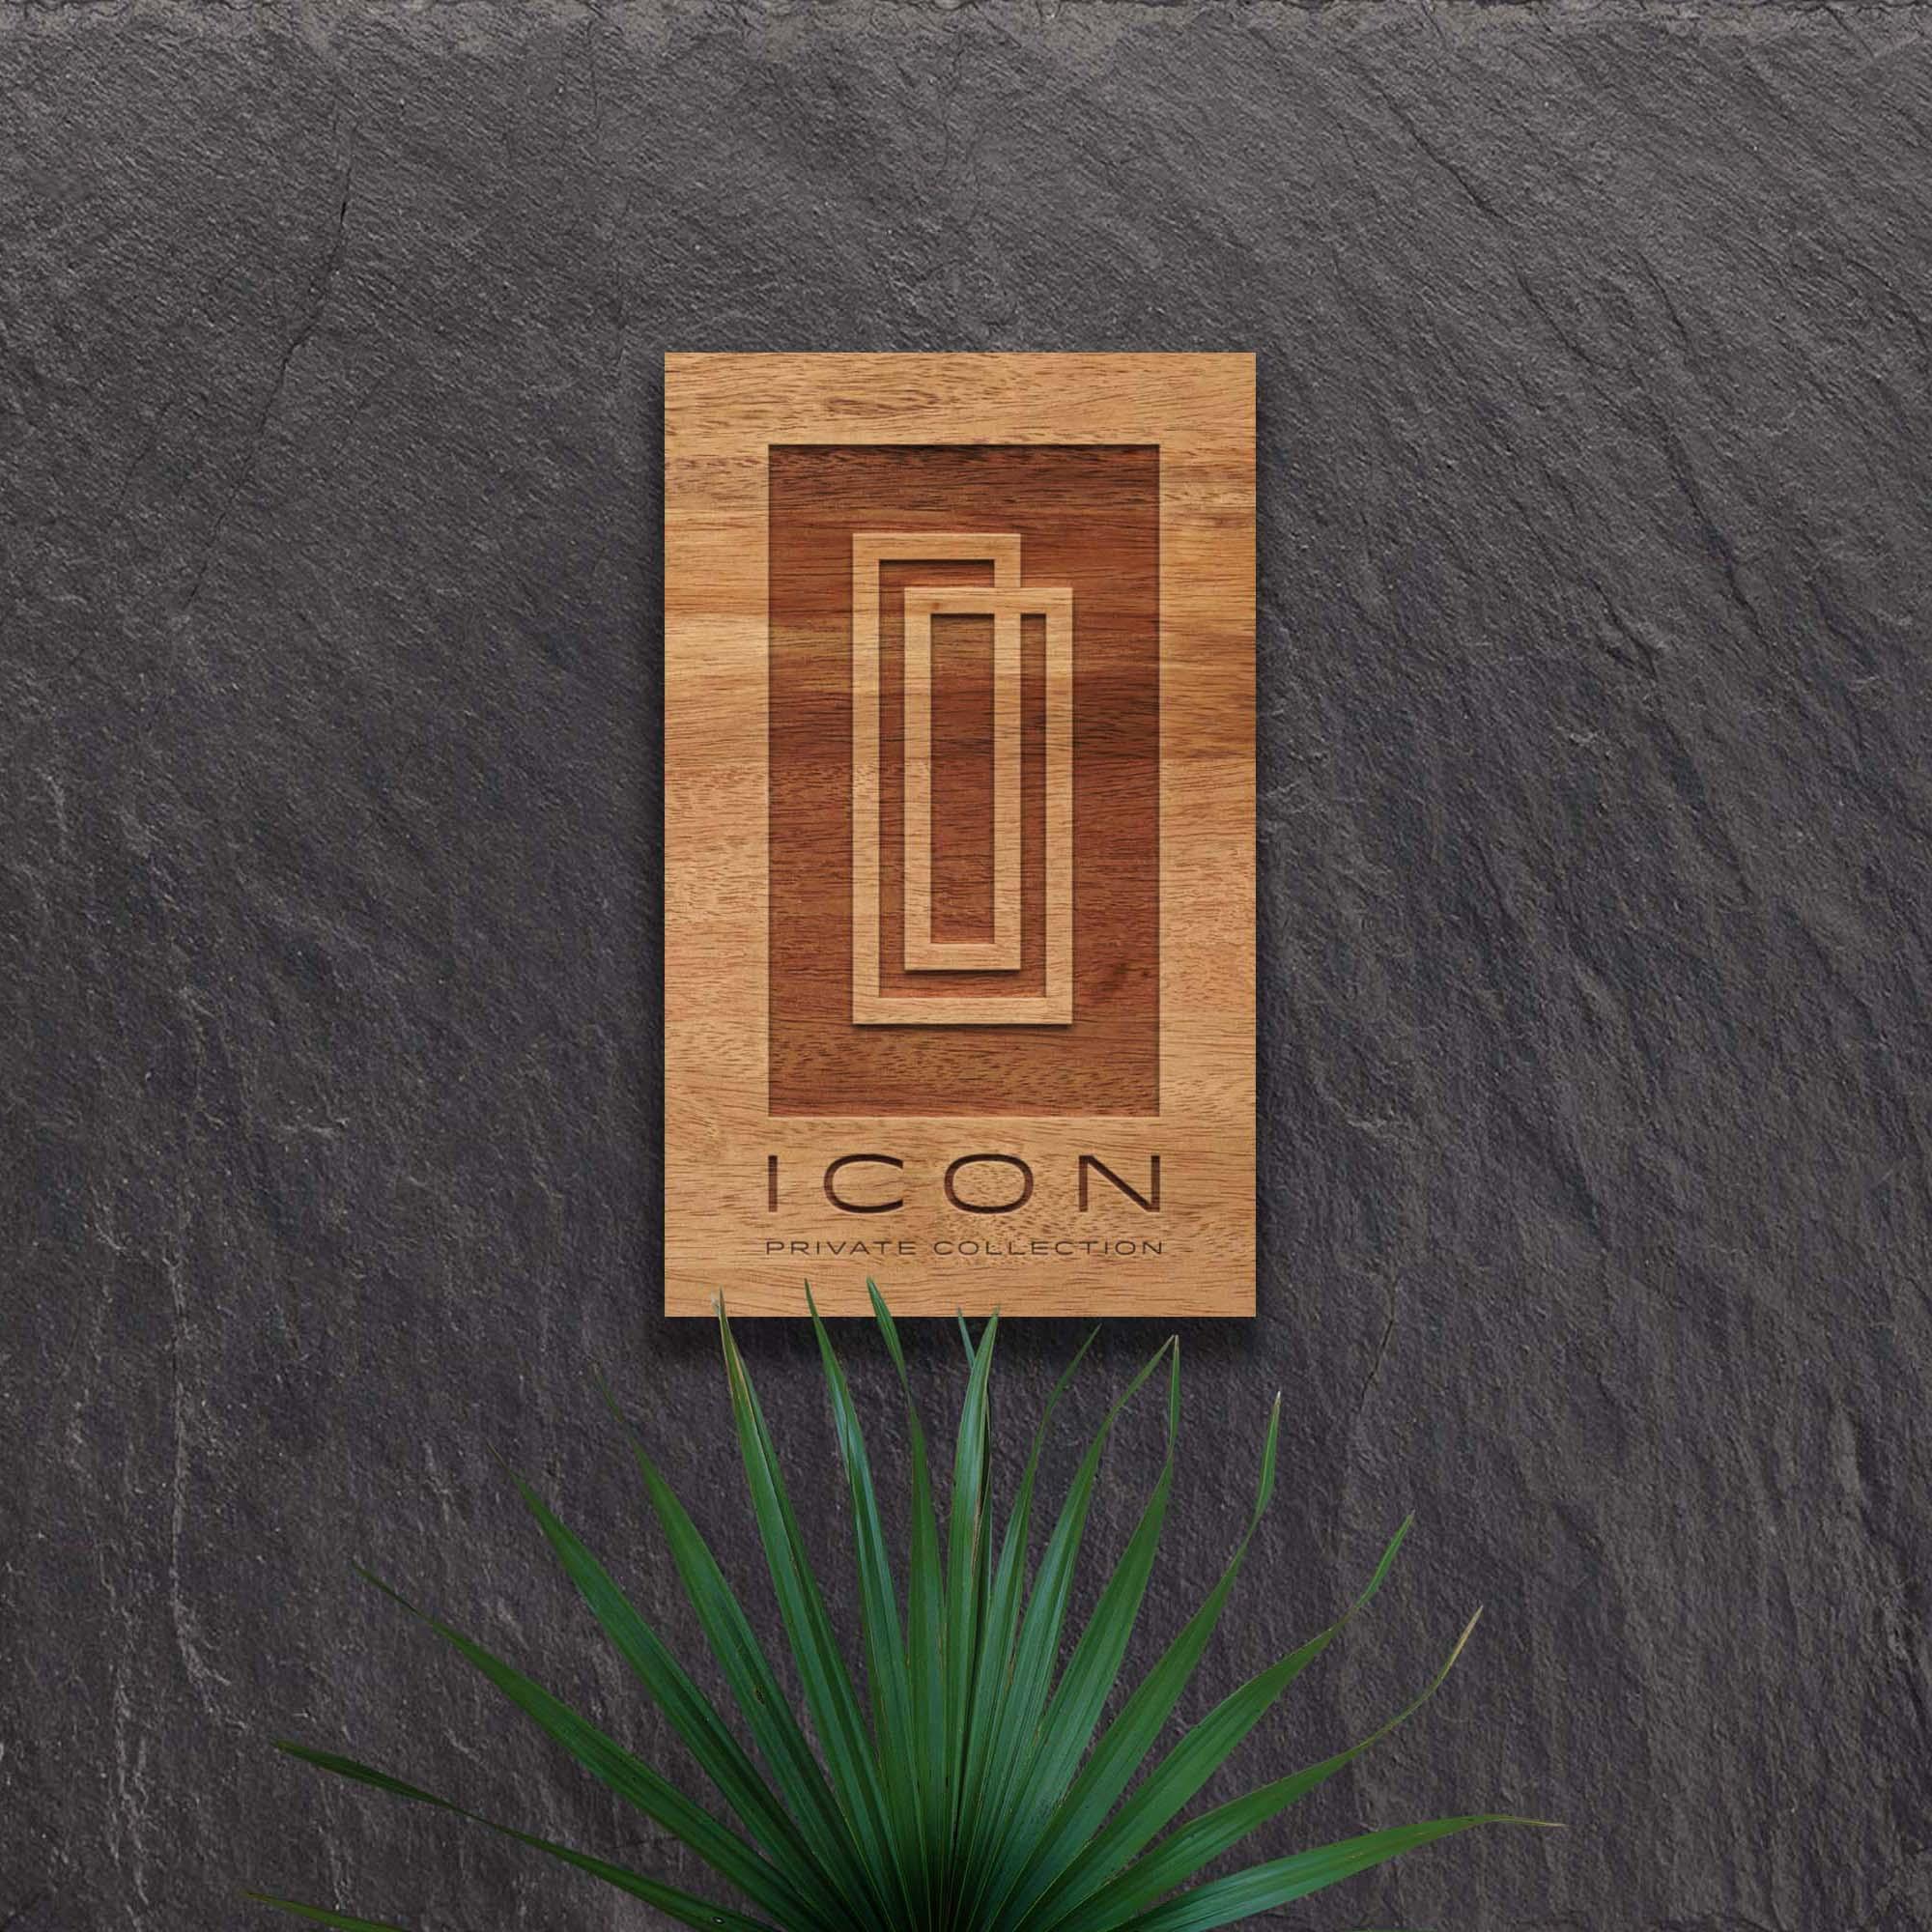 ICON private collection-logo hotel plaque